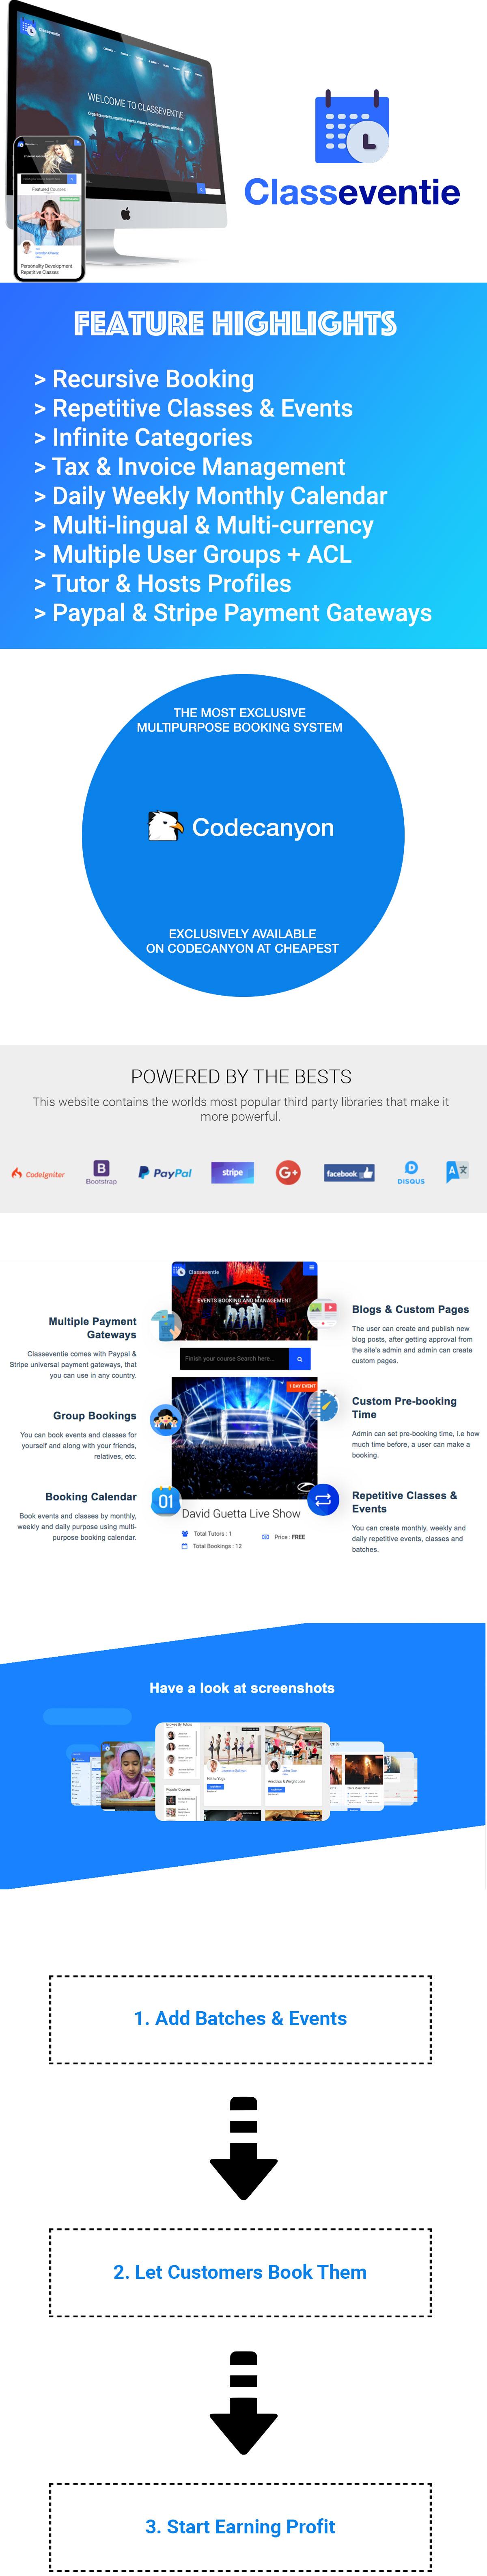 Classeventie - Multi-vendor - Get New Version Free Demo - Download Now - 7